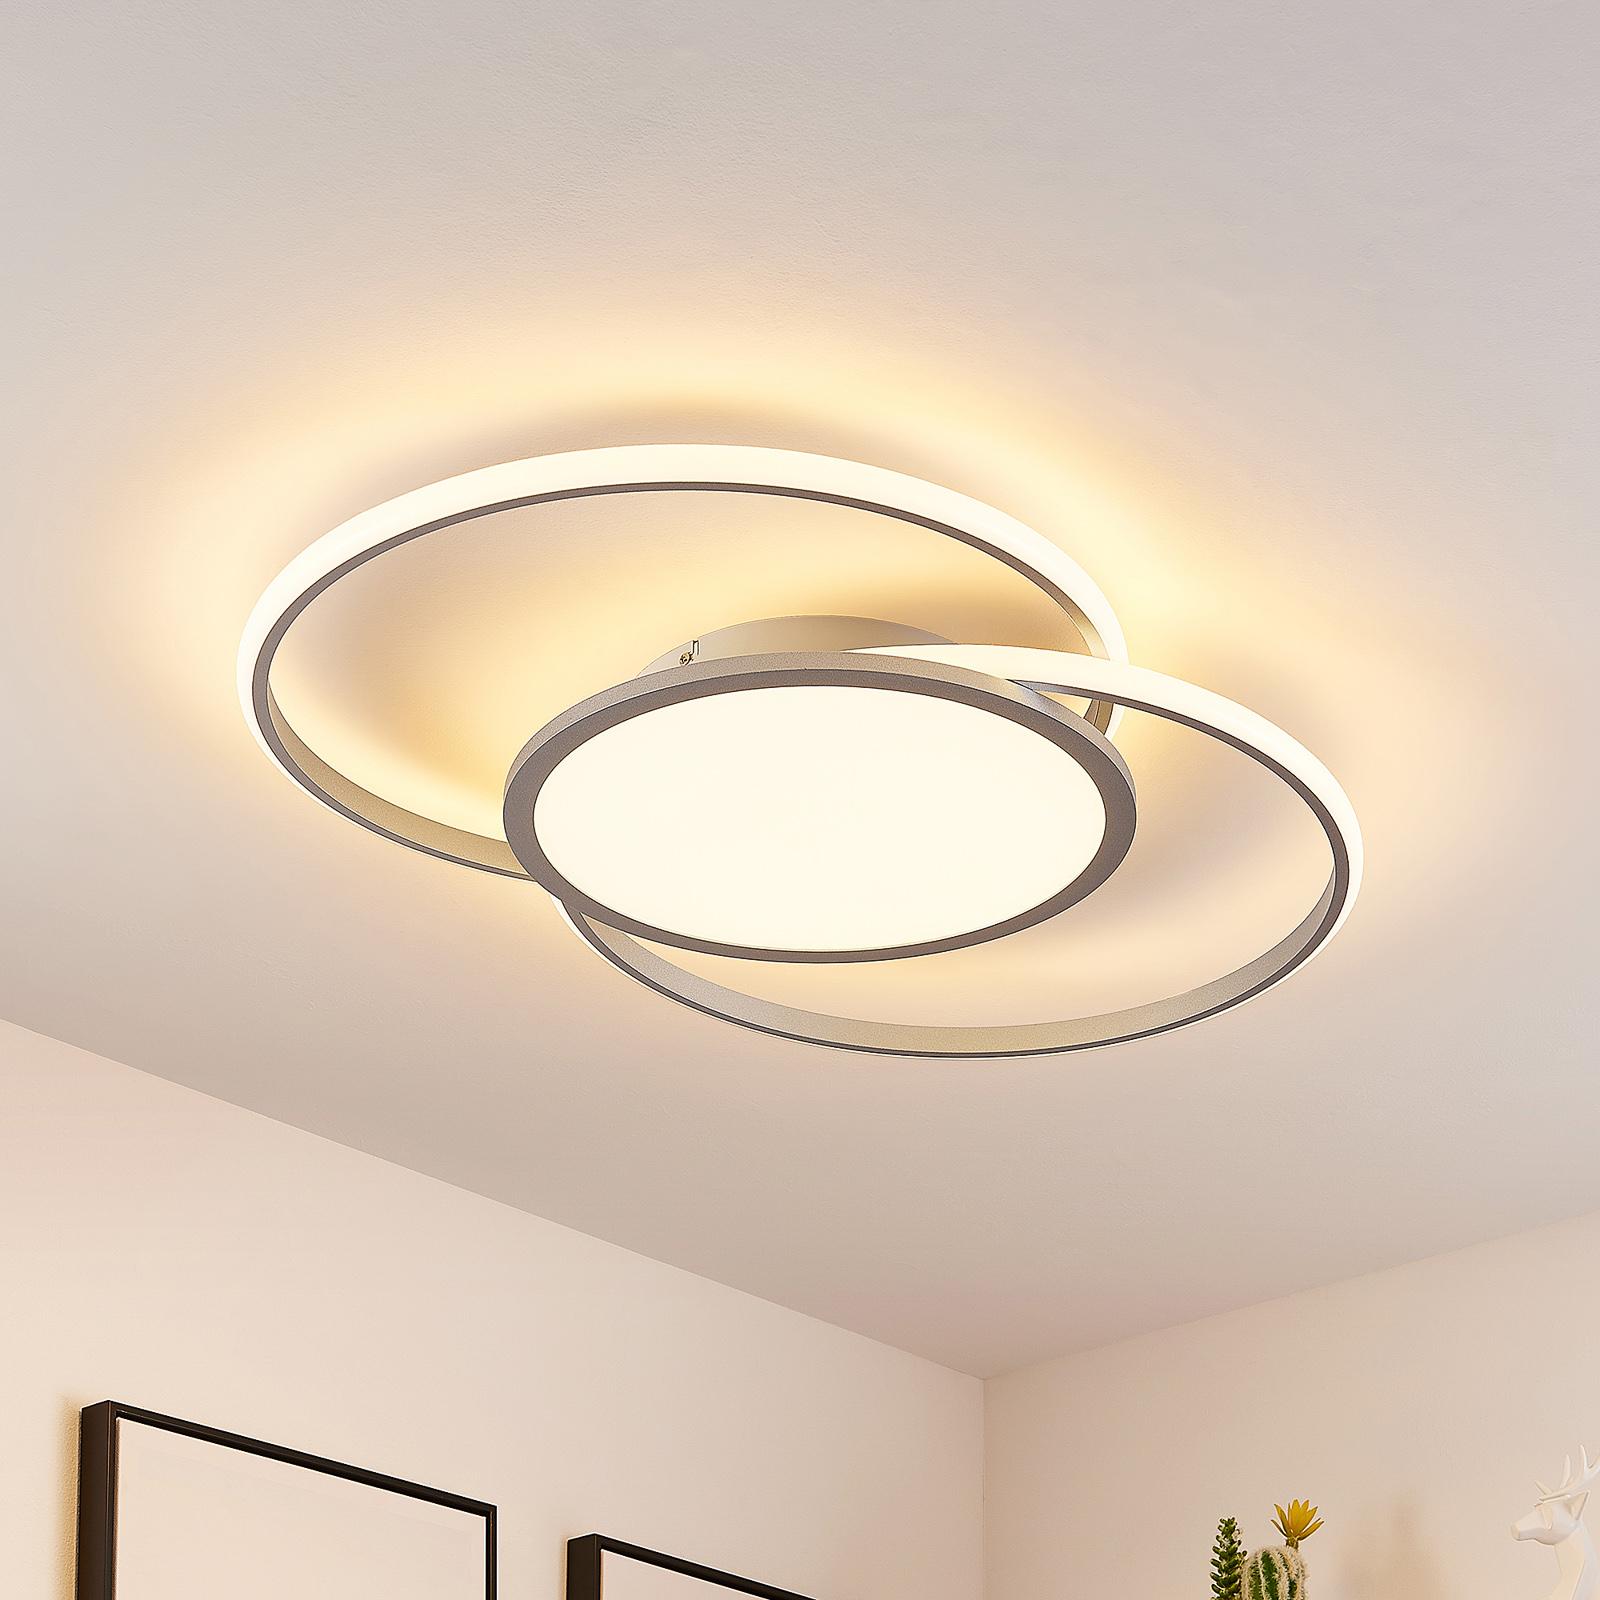 Lucande Senne LED-taklampe, CCT